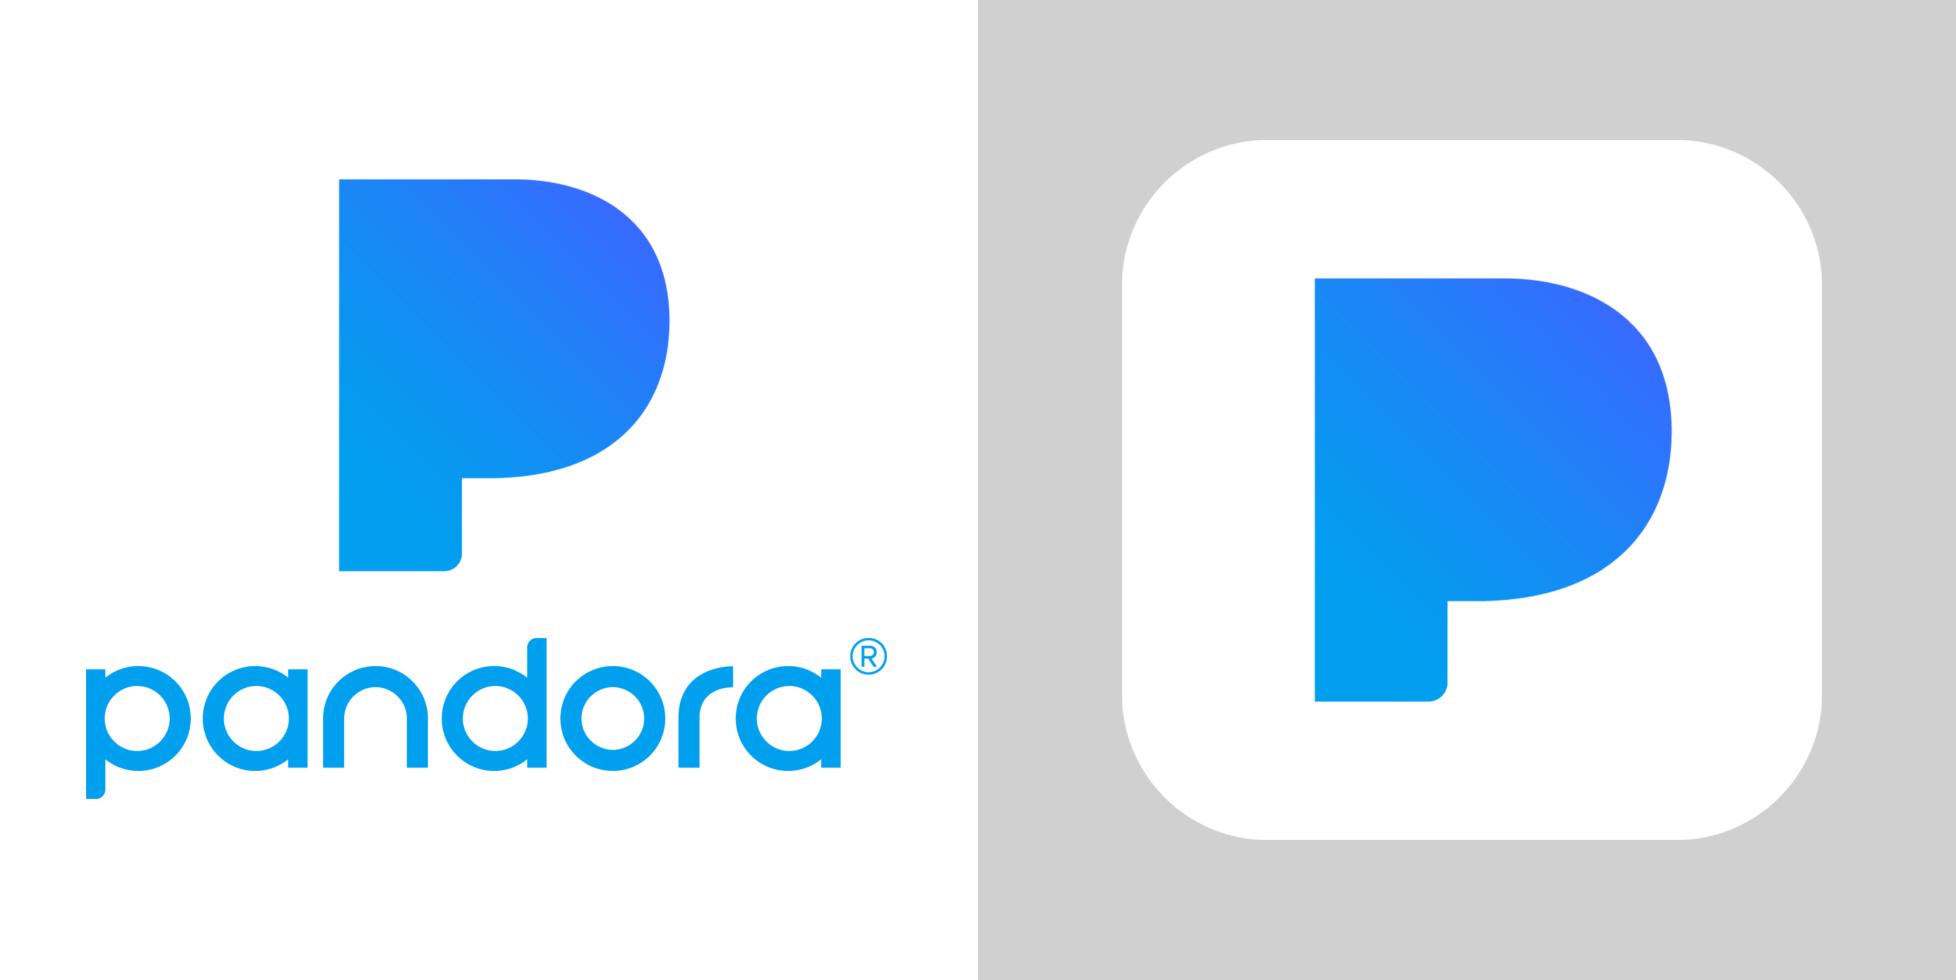 pandora logo eps png transparent pandora logo eps png images pluspng rh pluspng com pandora music logo vector pandora radio logo vector